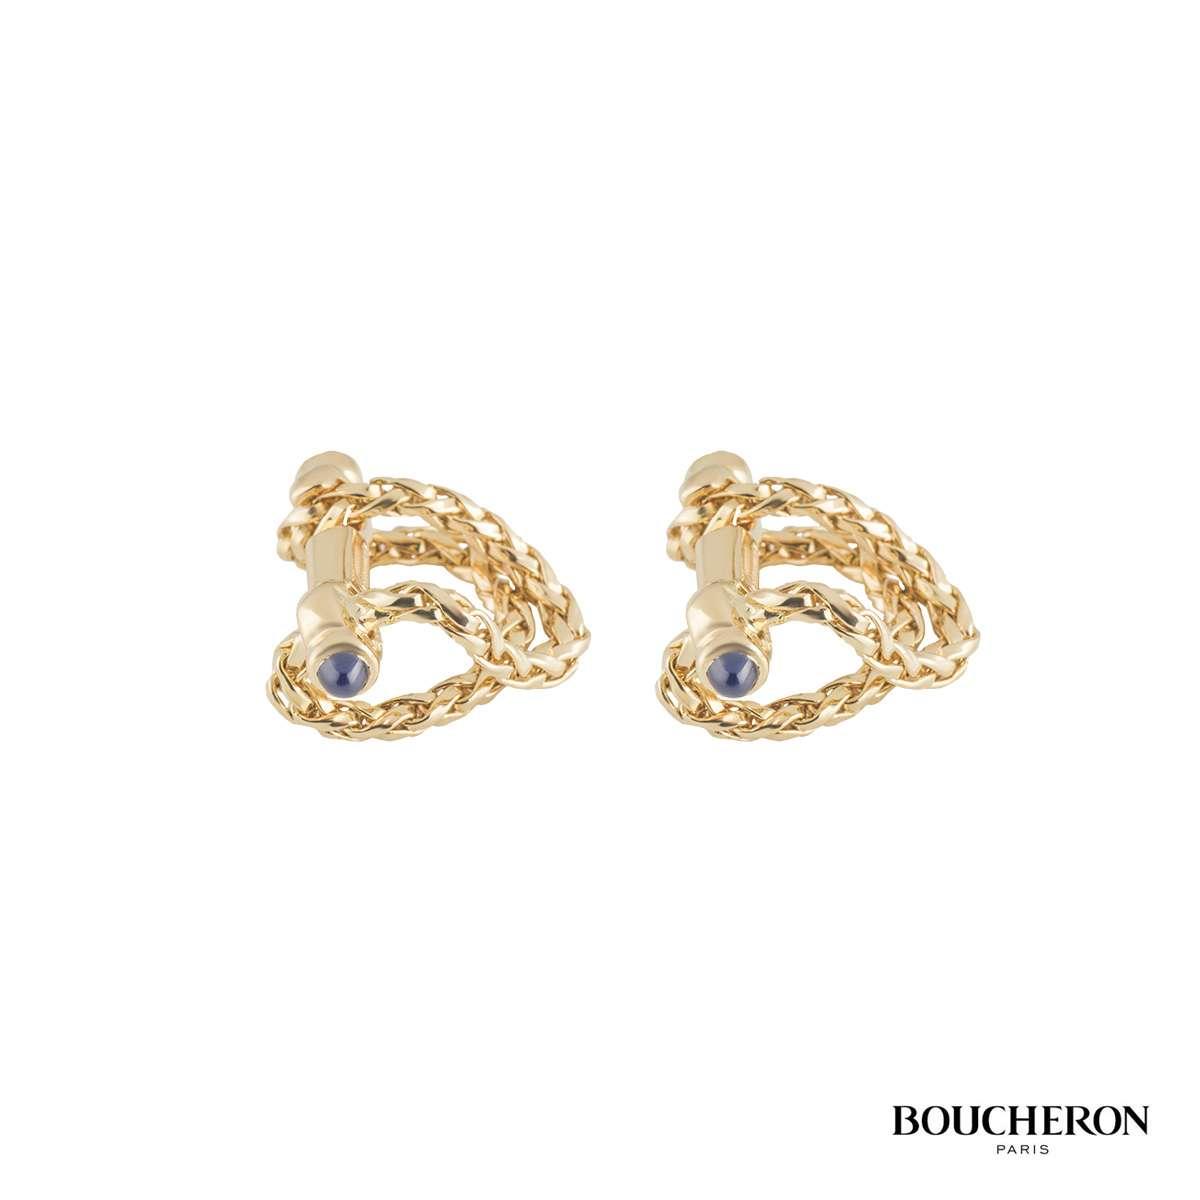 Boucheron 18k Yellow Gold & Sapphire Cufflinks